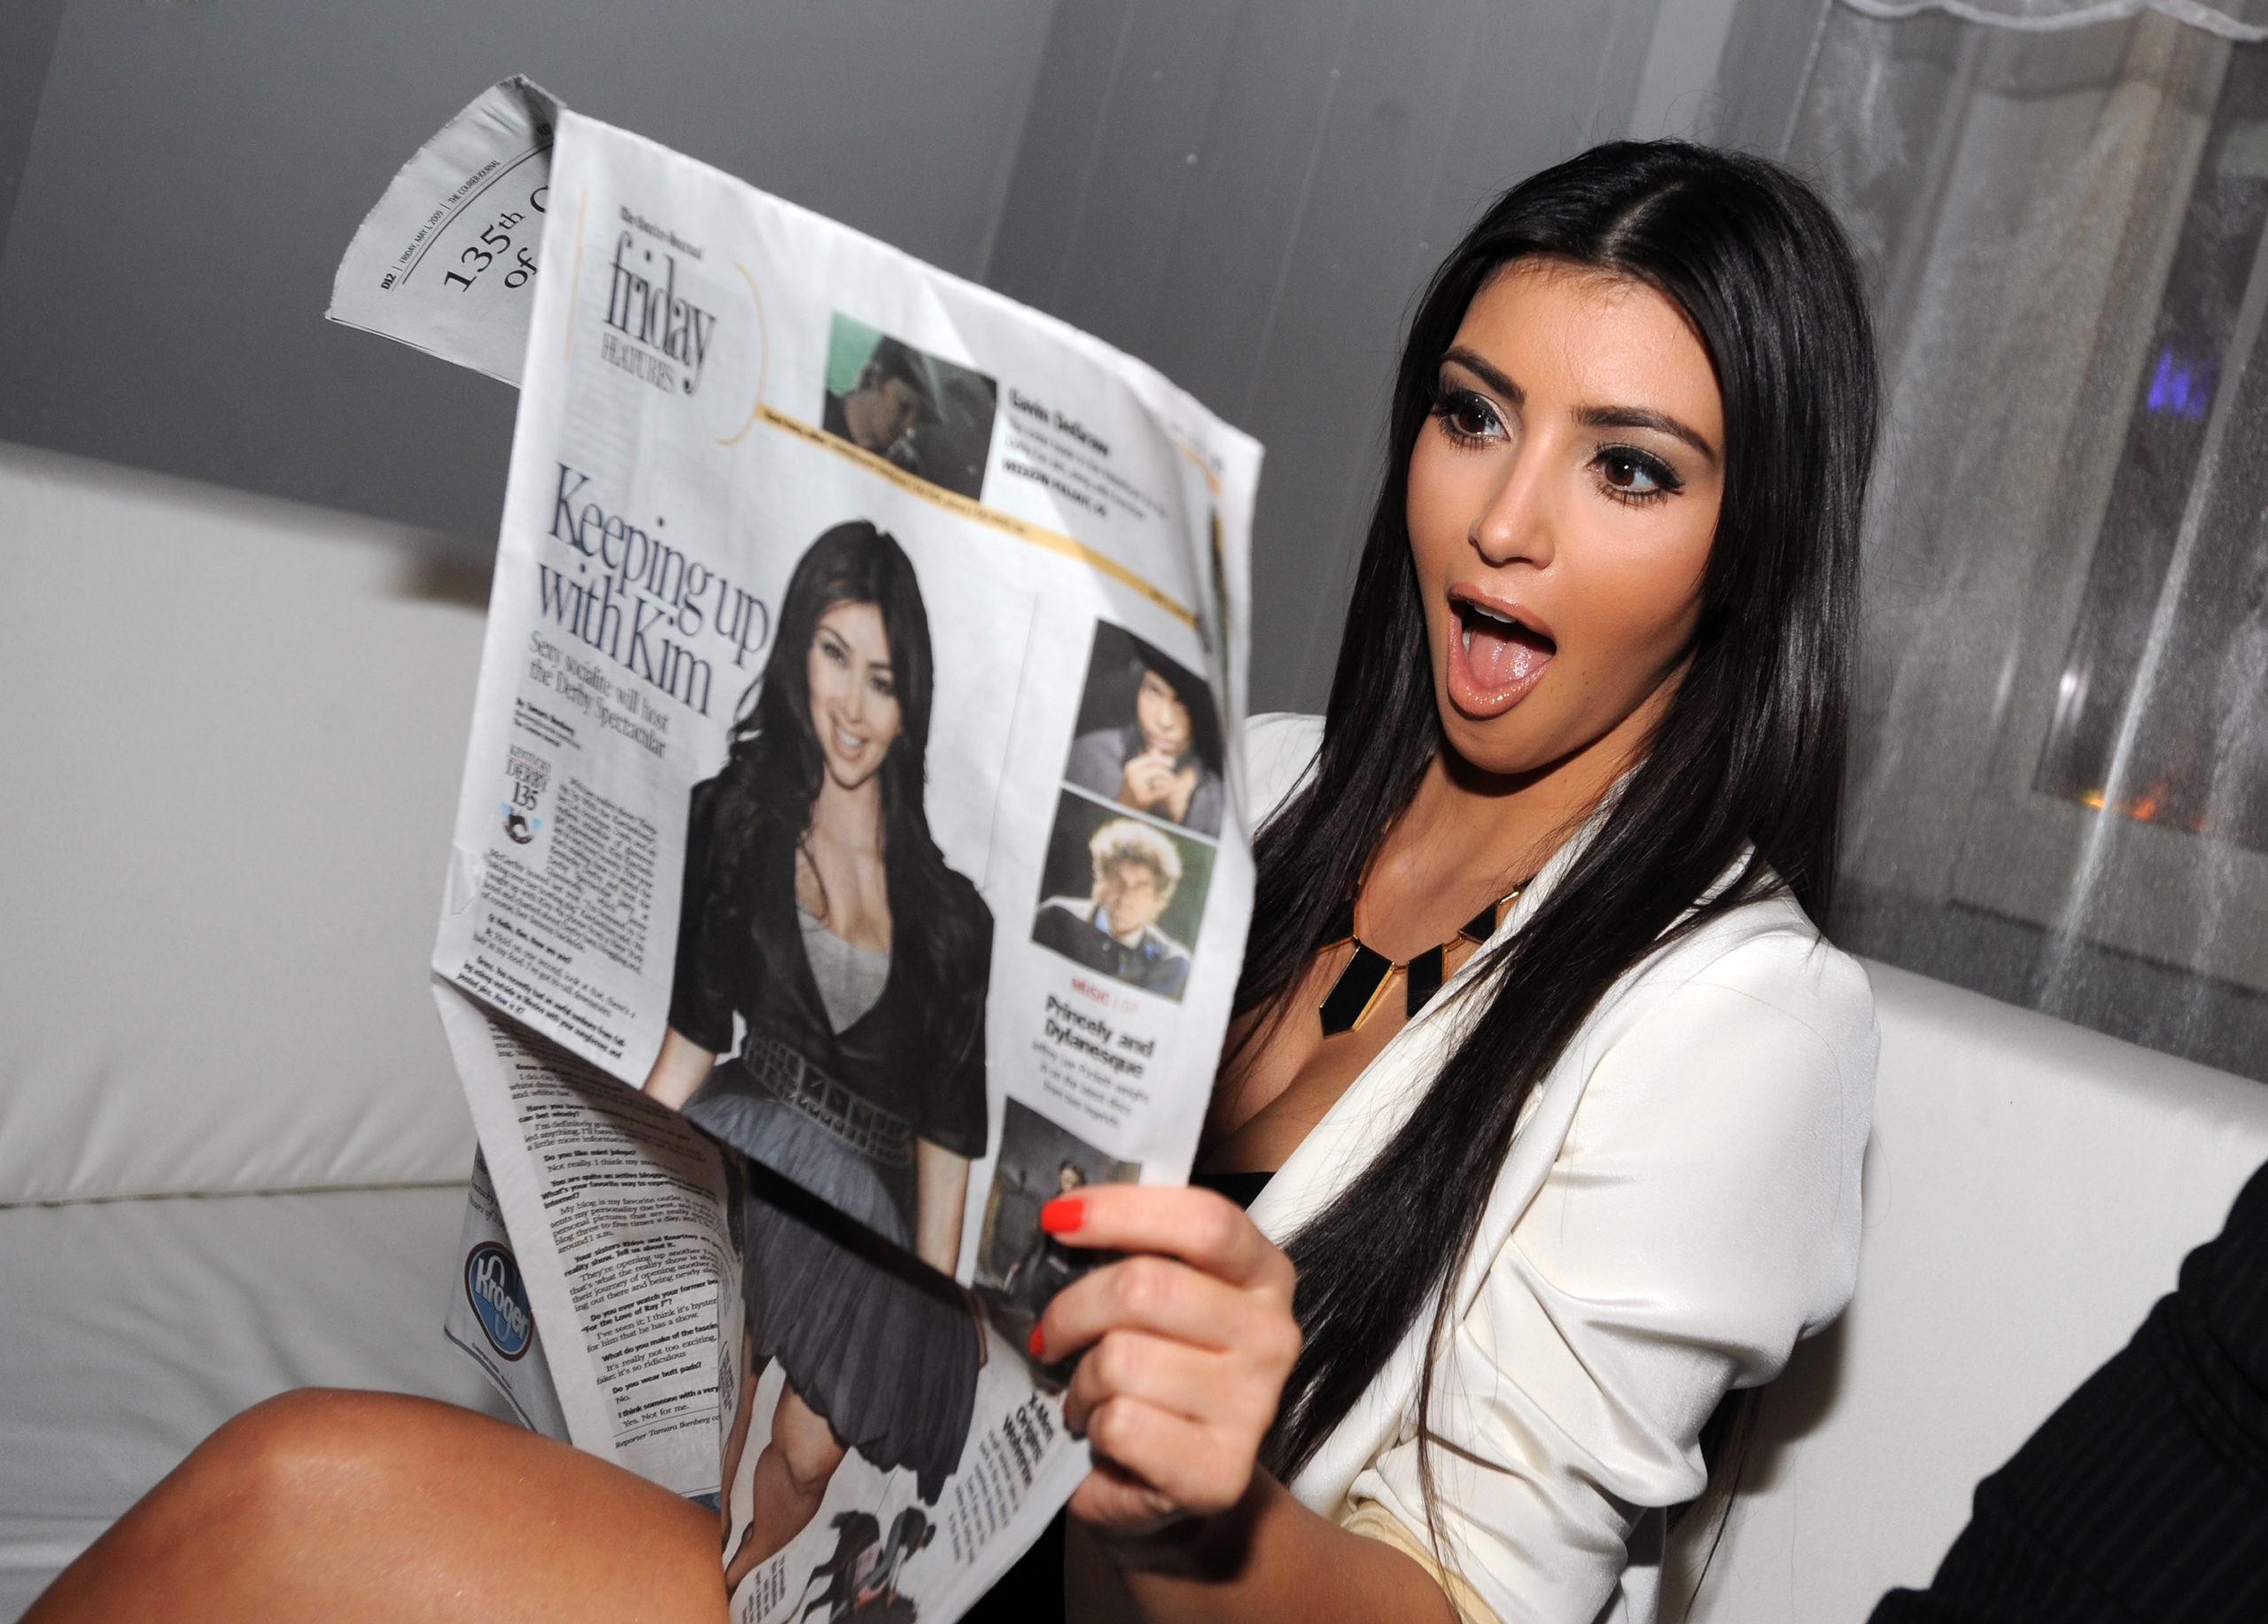 No longer keeping up with the Kardashians: A heartfelt goodbye to a complicated matriarchy - Daily Maverick